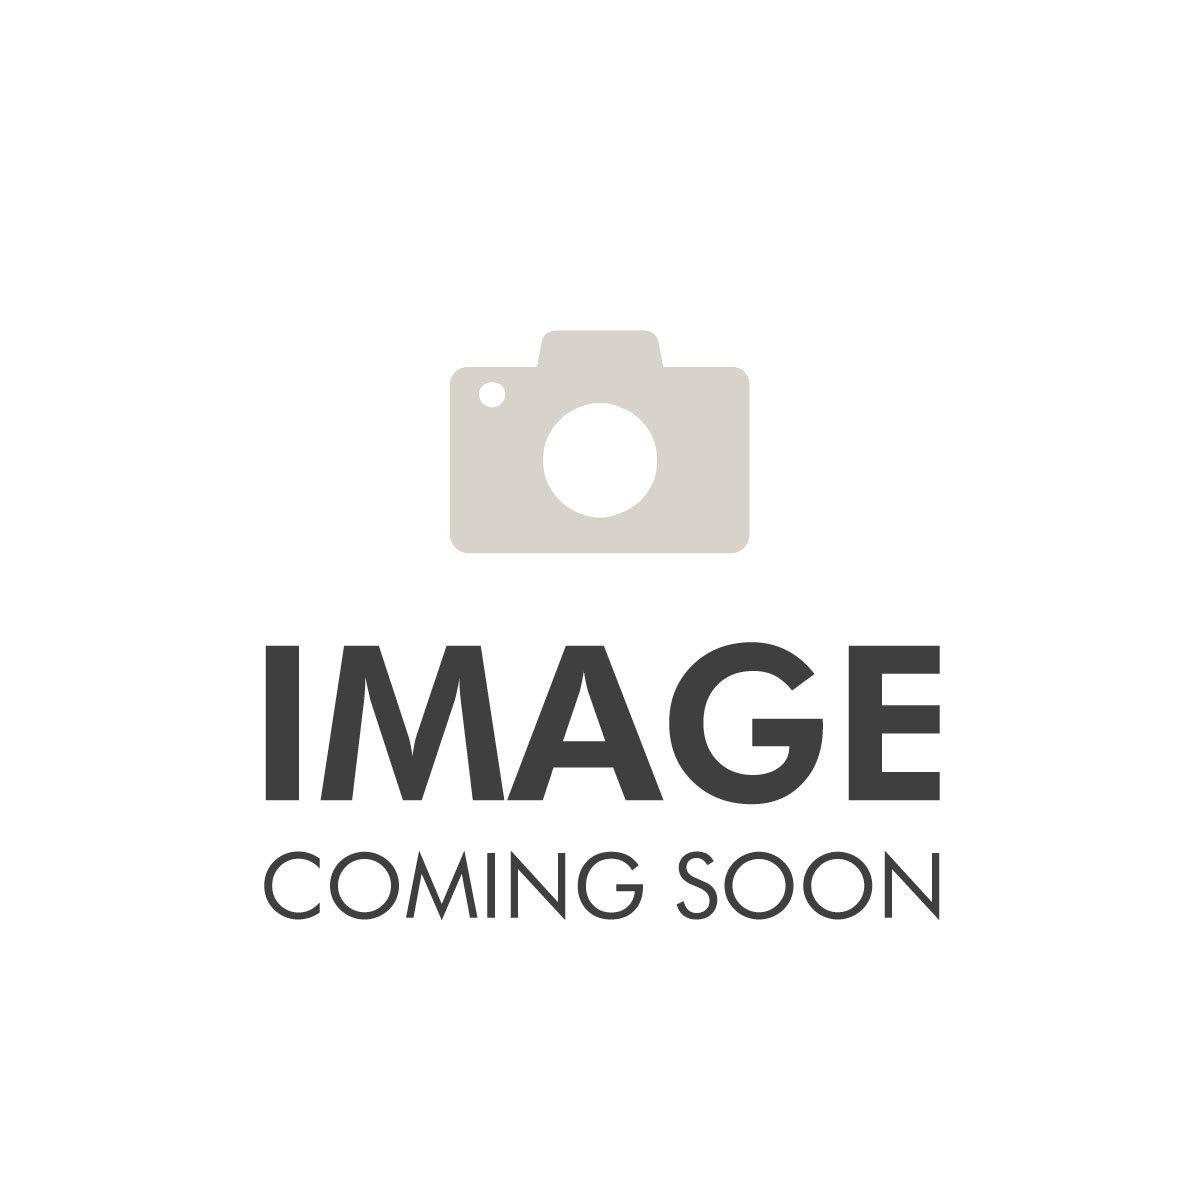 Revlon Colorstay Makeup - Liquid Foundation - Combination/Oily Skin 30ml - Golden Beige